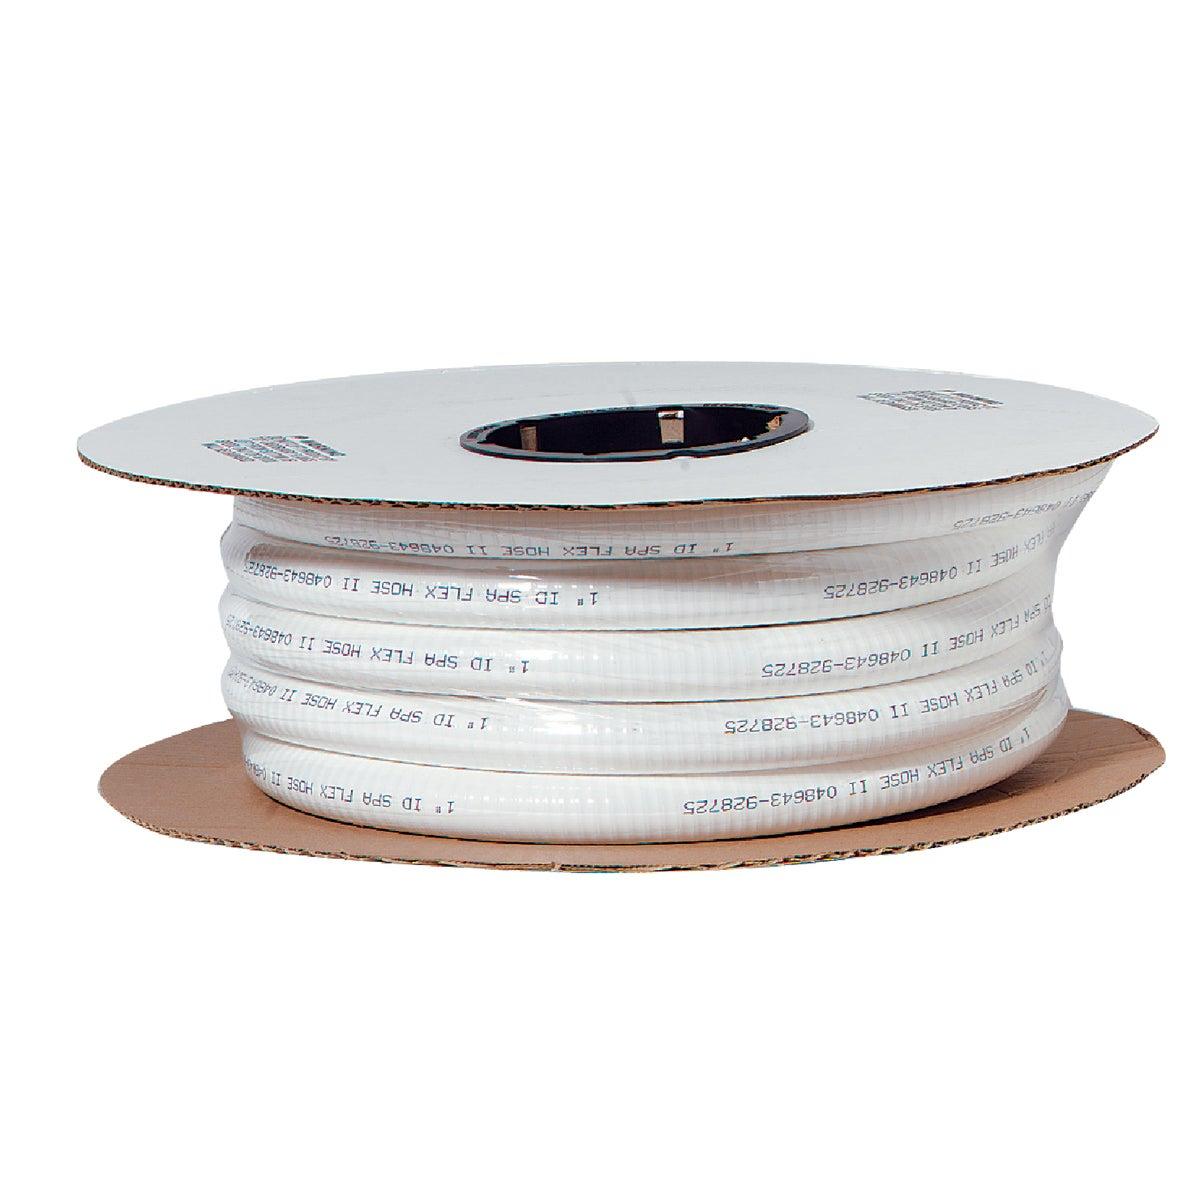 "1""IDX50' SPA HOSE - RSFN by Watts Regulator Co"